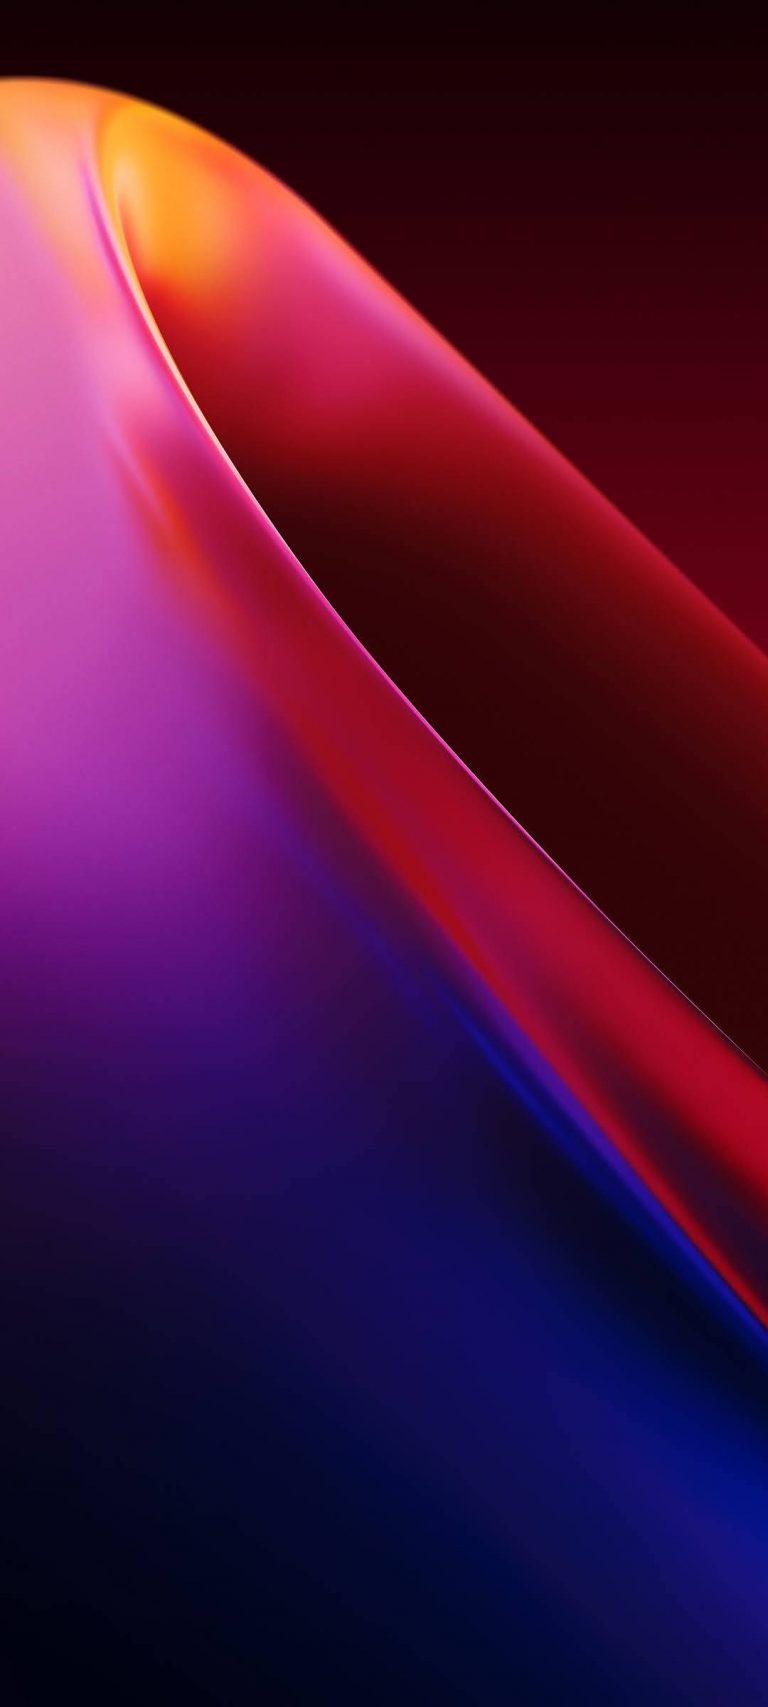 OnePlus Nord Stock Wallpaper [1080x2400] - 06